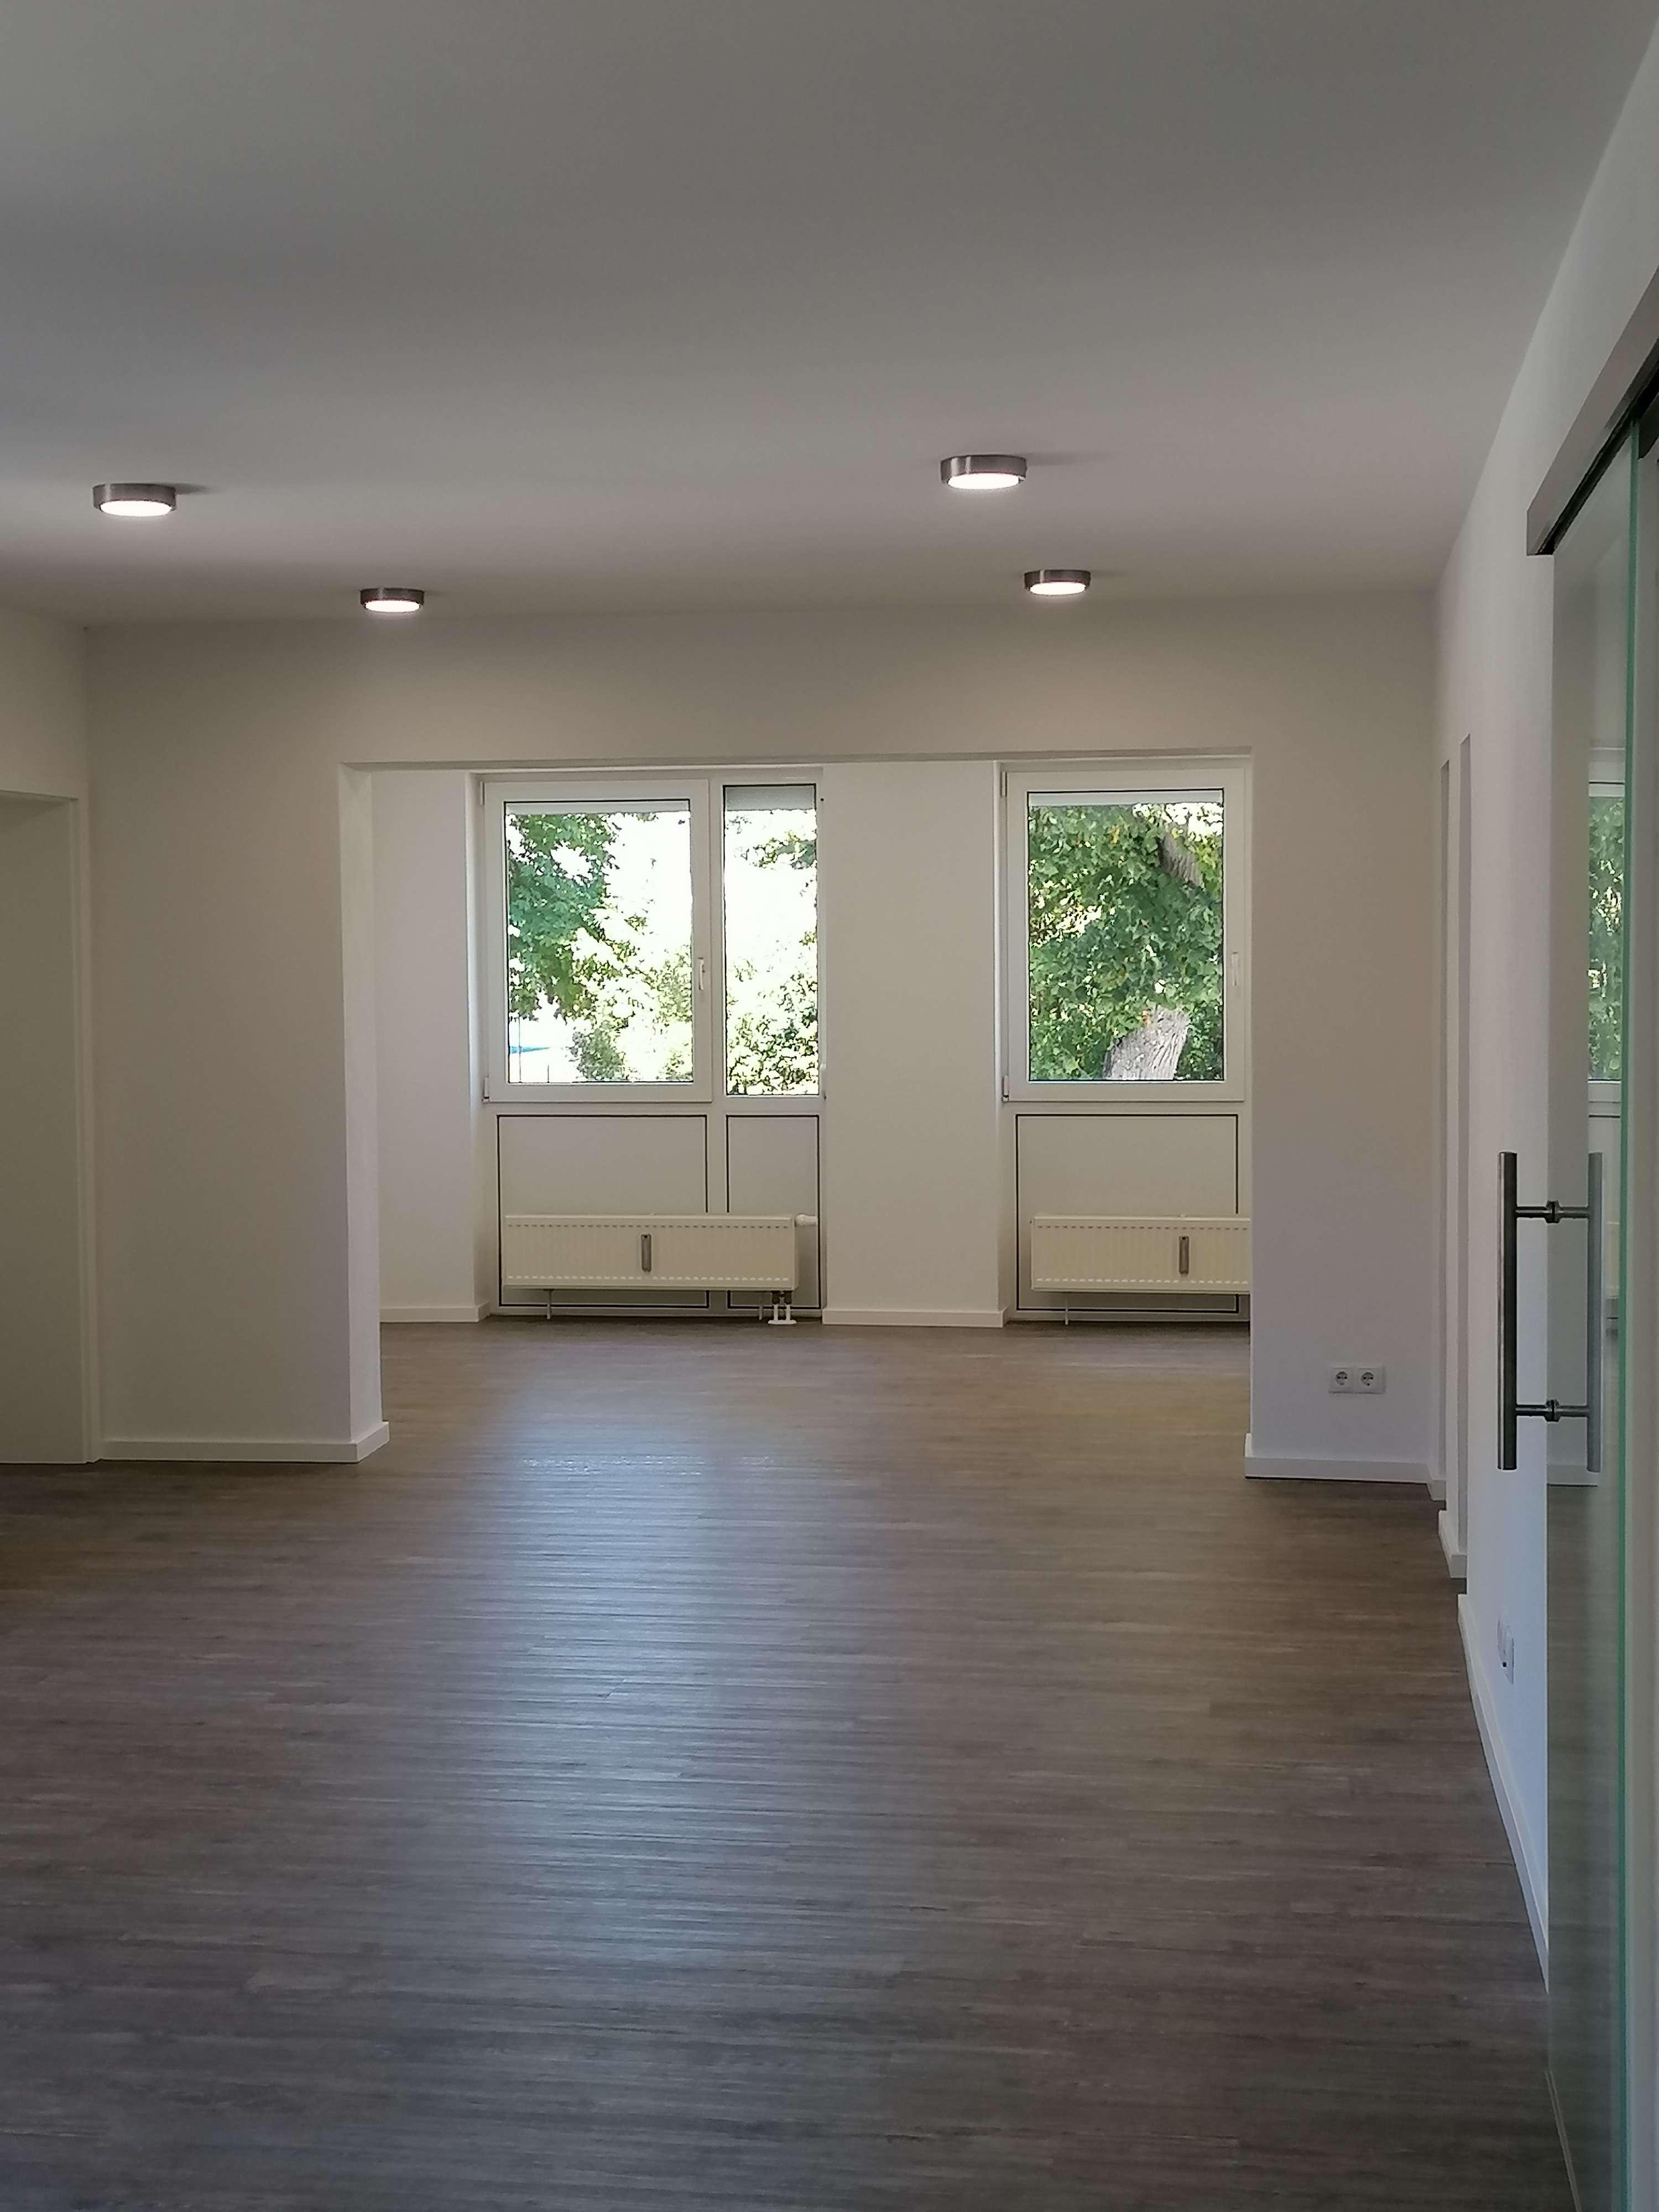 Erstbezug - Attraktive 2 Zimmer Erdgeschoss Wohnung zu vermieten in